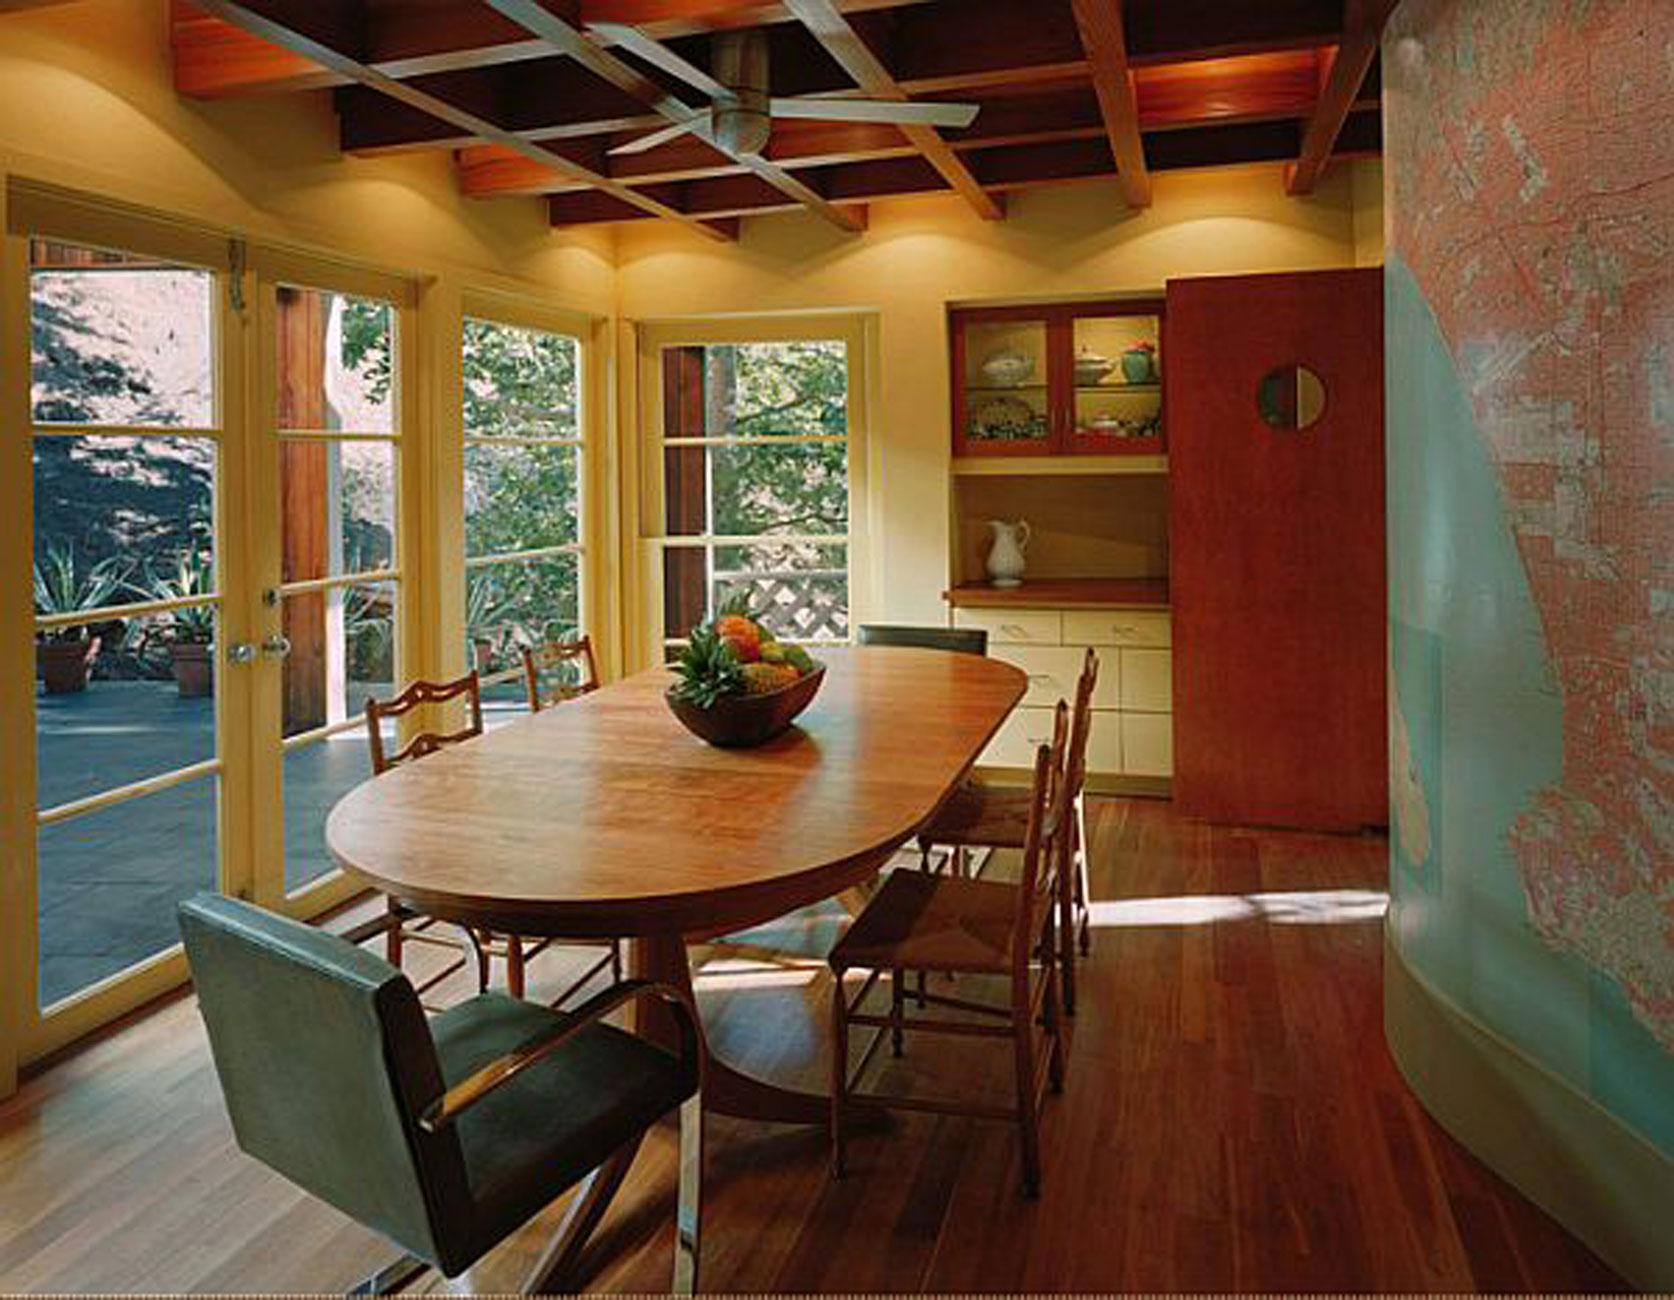 » Contemporary Mountain House With Wooden Interior Design